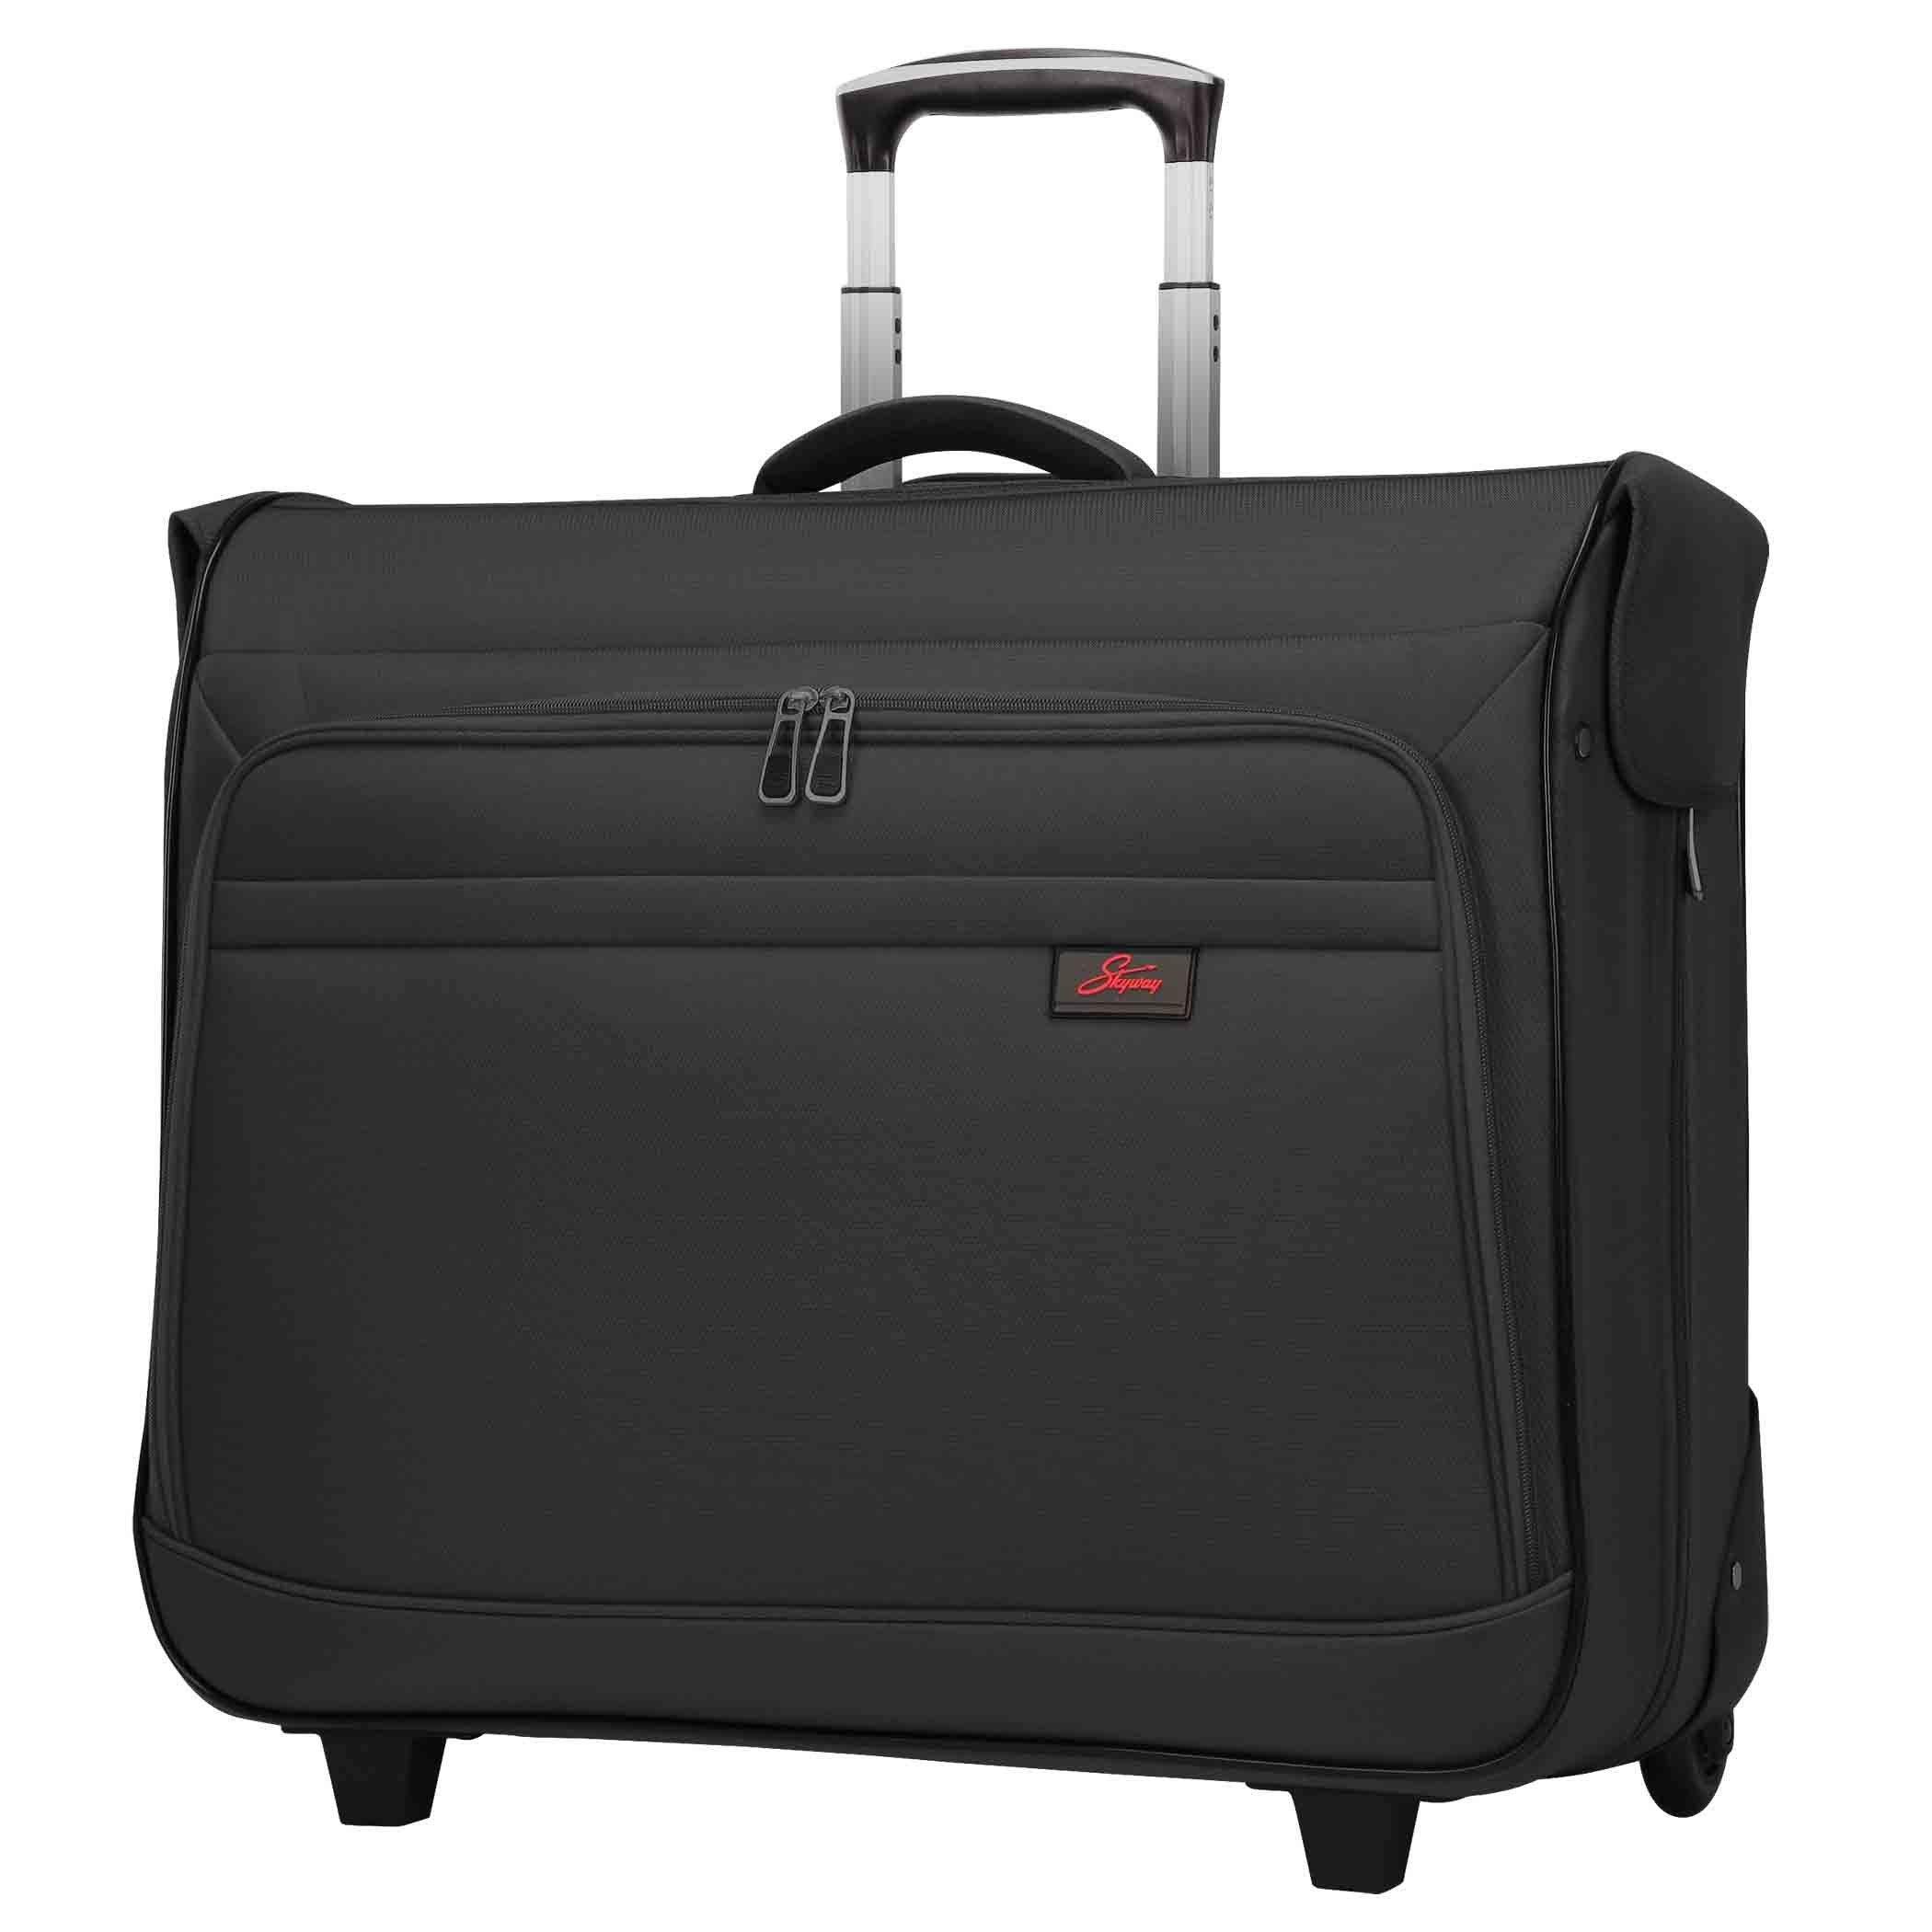 Skyway Sigma 5.0 42-Inch 2 Wheeled Garment Bag, Black, One Size